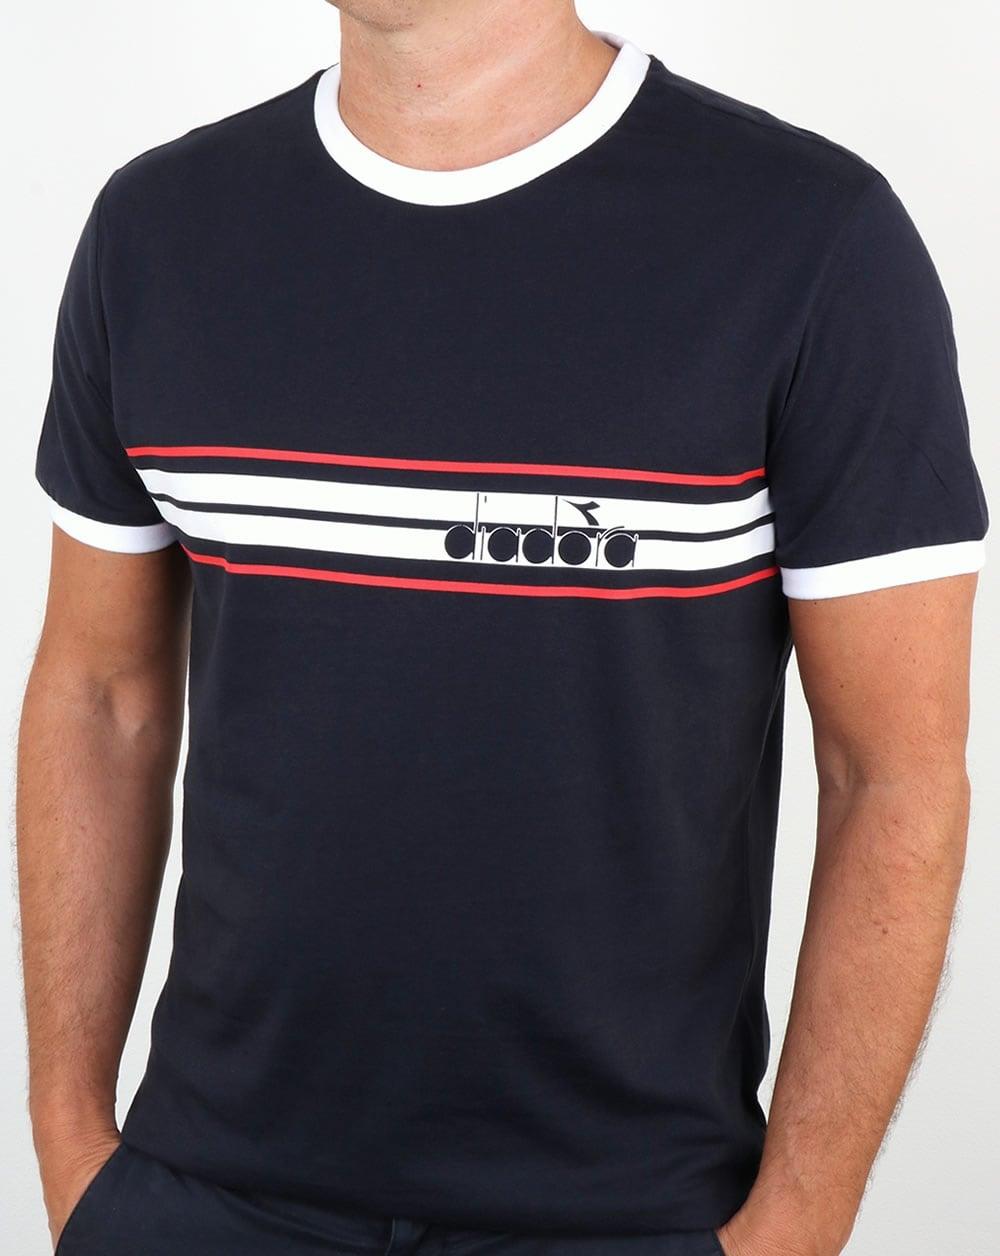 Diadora Serifos Og T Shirt Blue Corsair, Men's, Tee, Crew neck